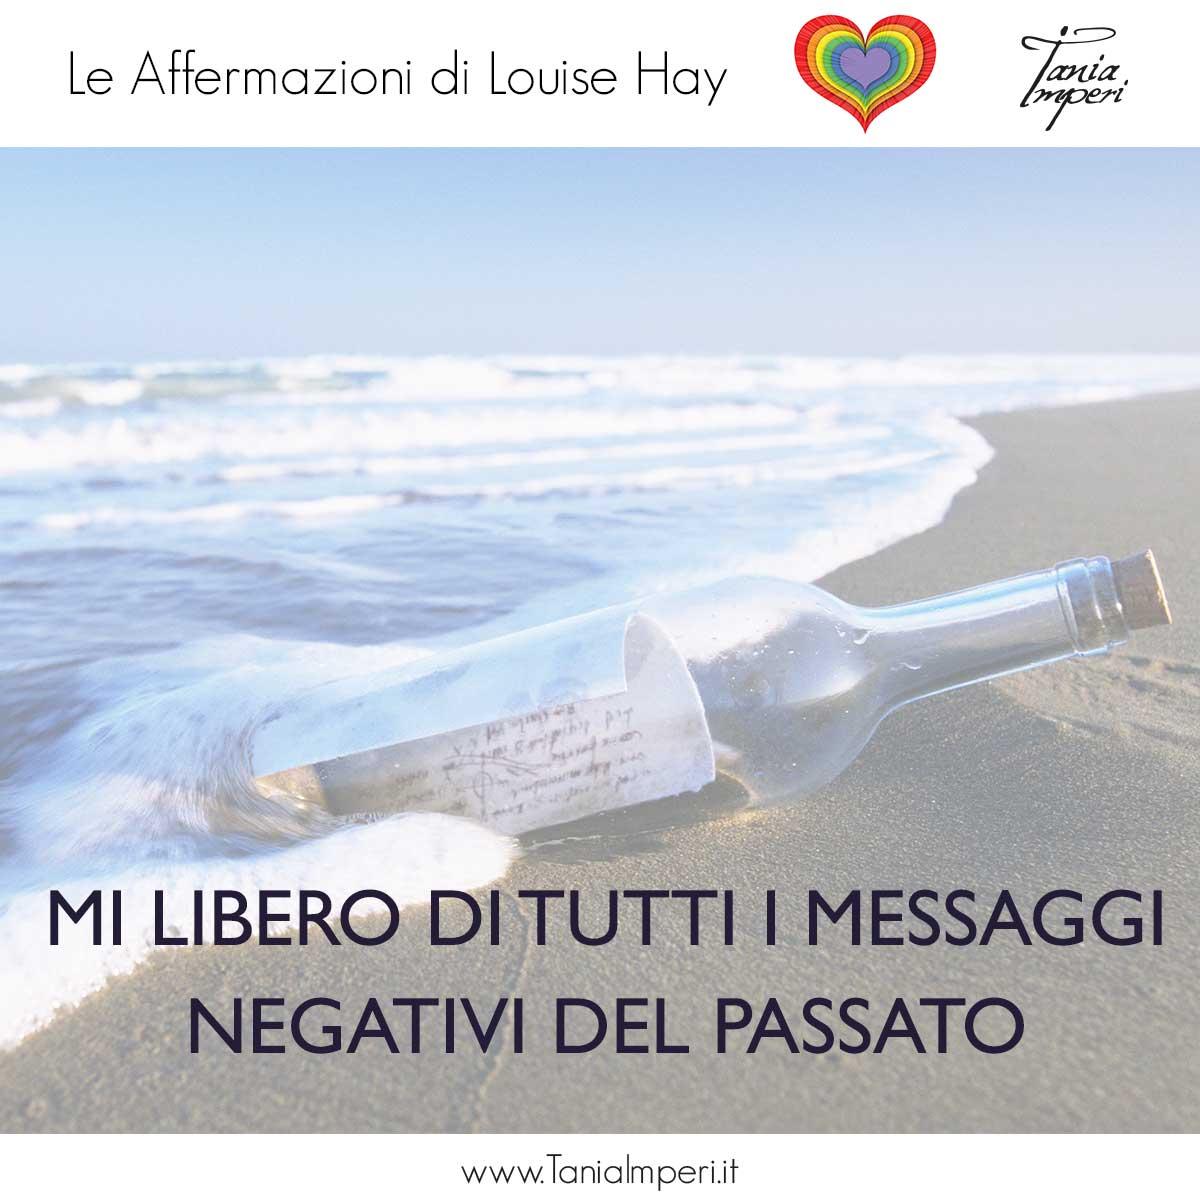 AFFERMAZIONI_LOUISE_HAY_TANIA_IMPERI_27_MI_LIBERO_DI_TUTTI-I-MESSAGGI-NEGATIVI-03LUG2017